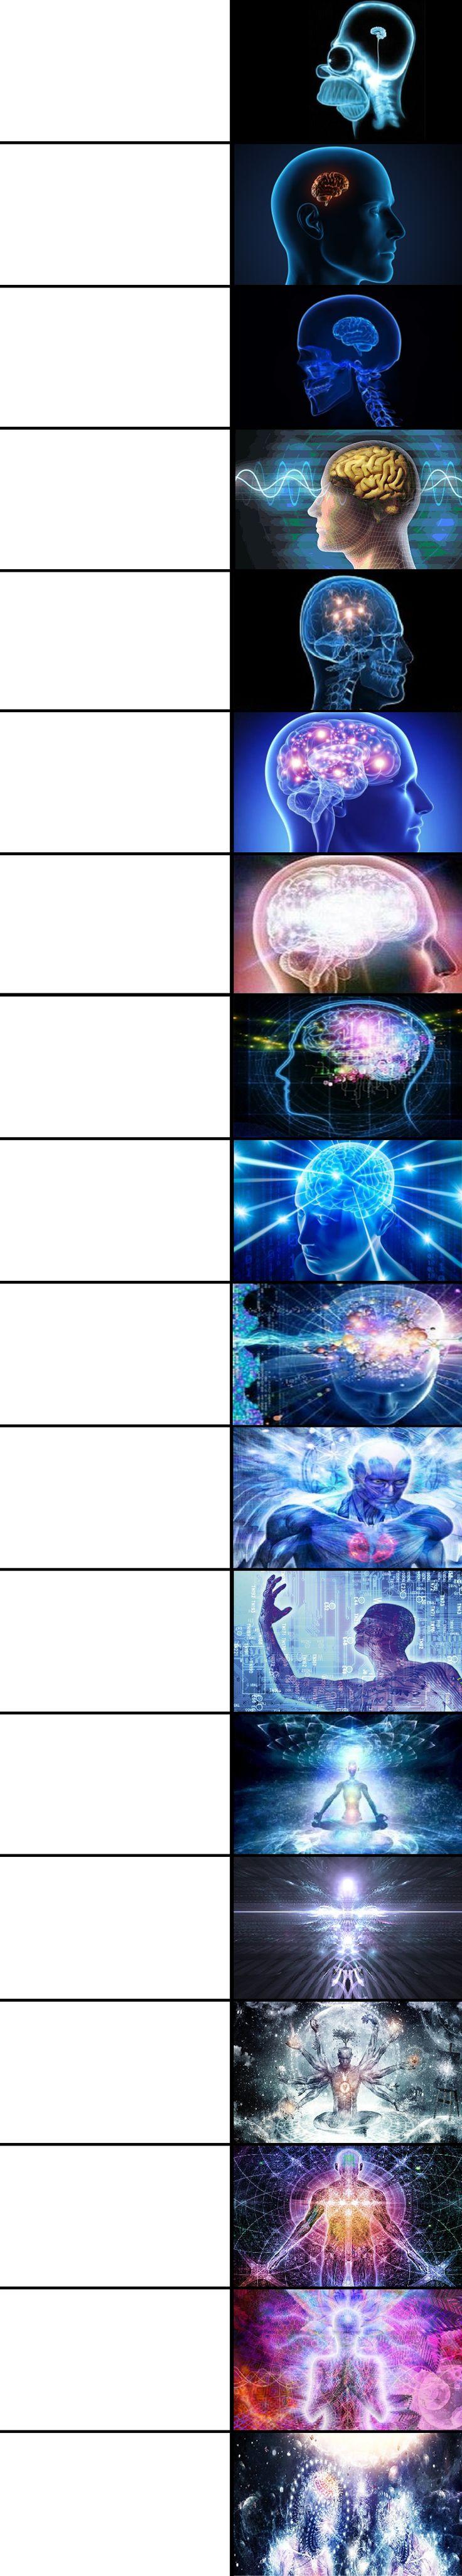 Expanding Template. | Expanding Brain | Know Your Meme